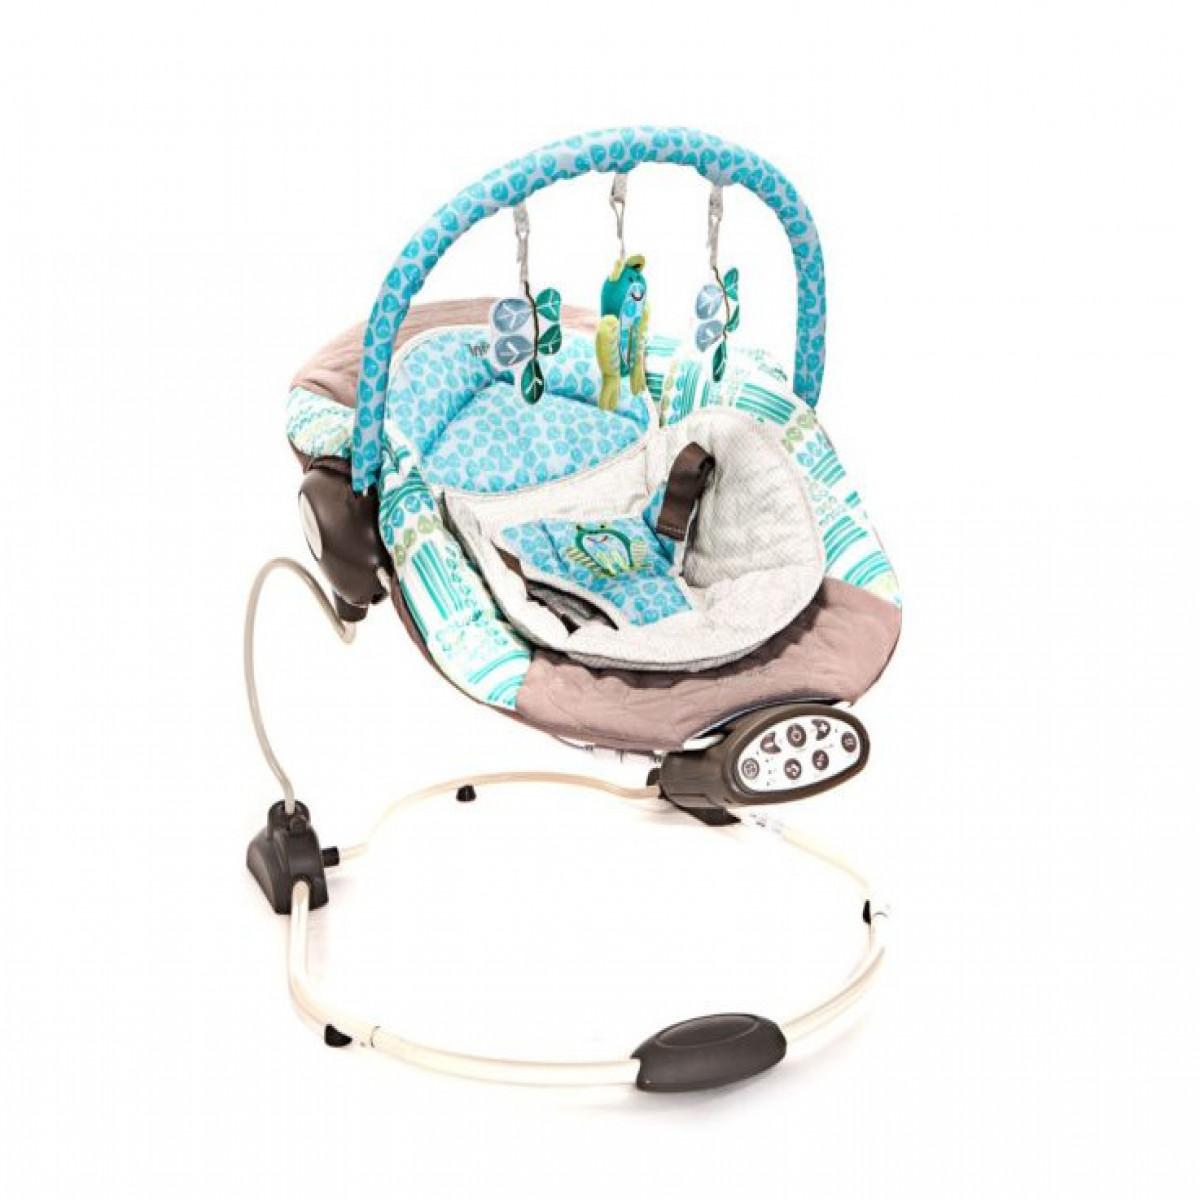 Mecedora musical vibrador Infanti turquesa